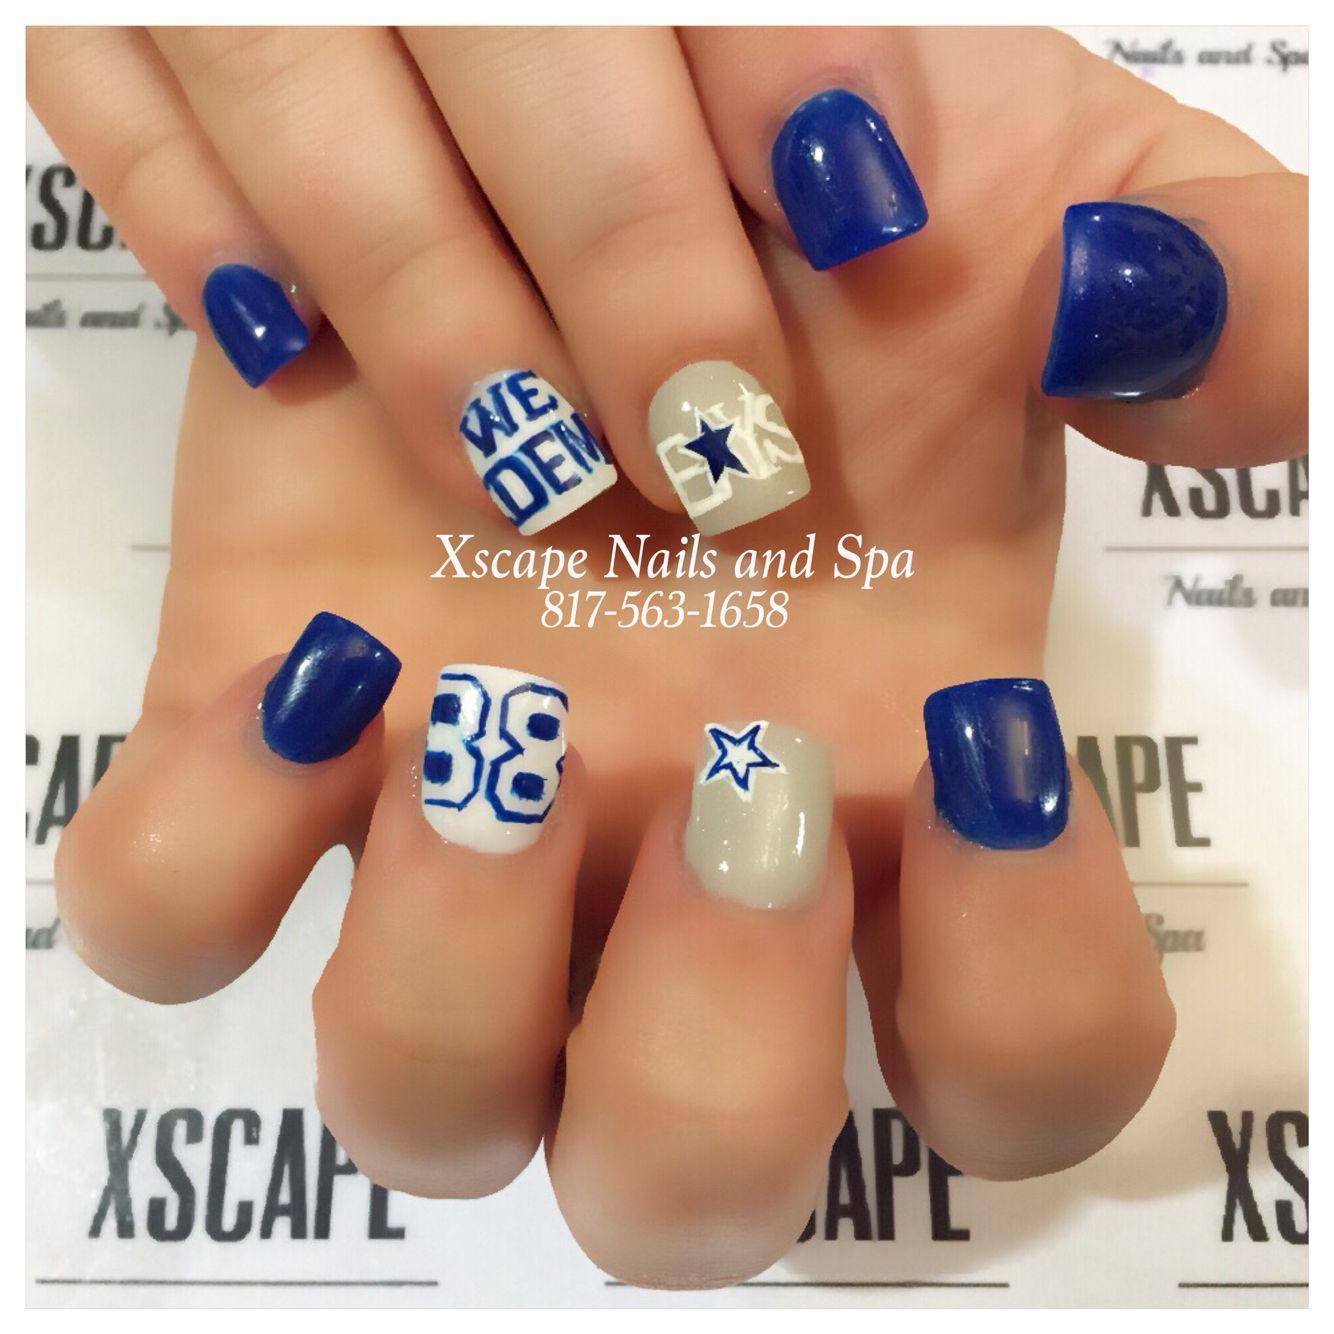 Dallas Cowboys nails | Cute Nails Designs | Pinterest | Dallas ...